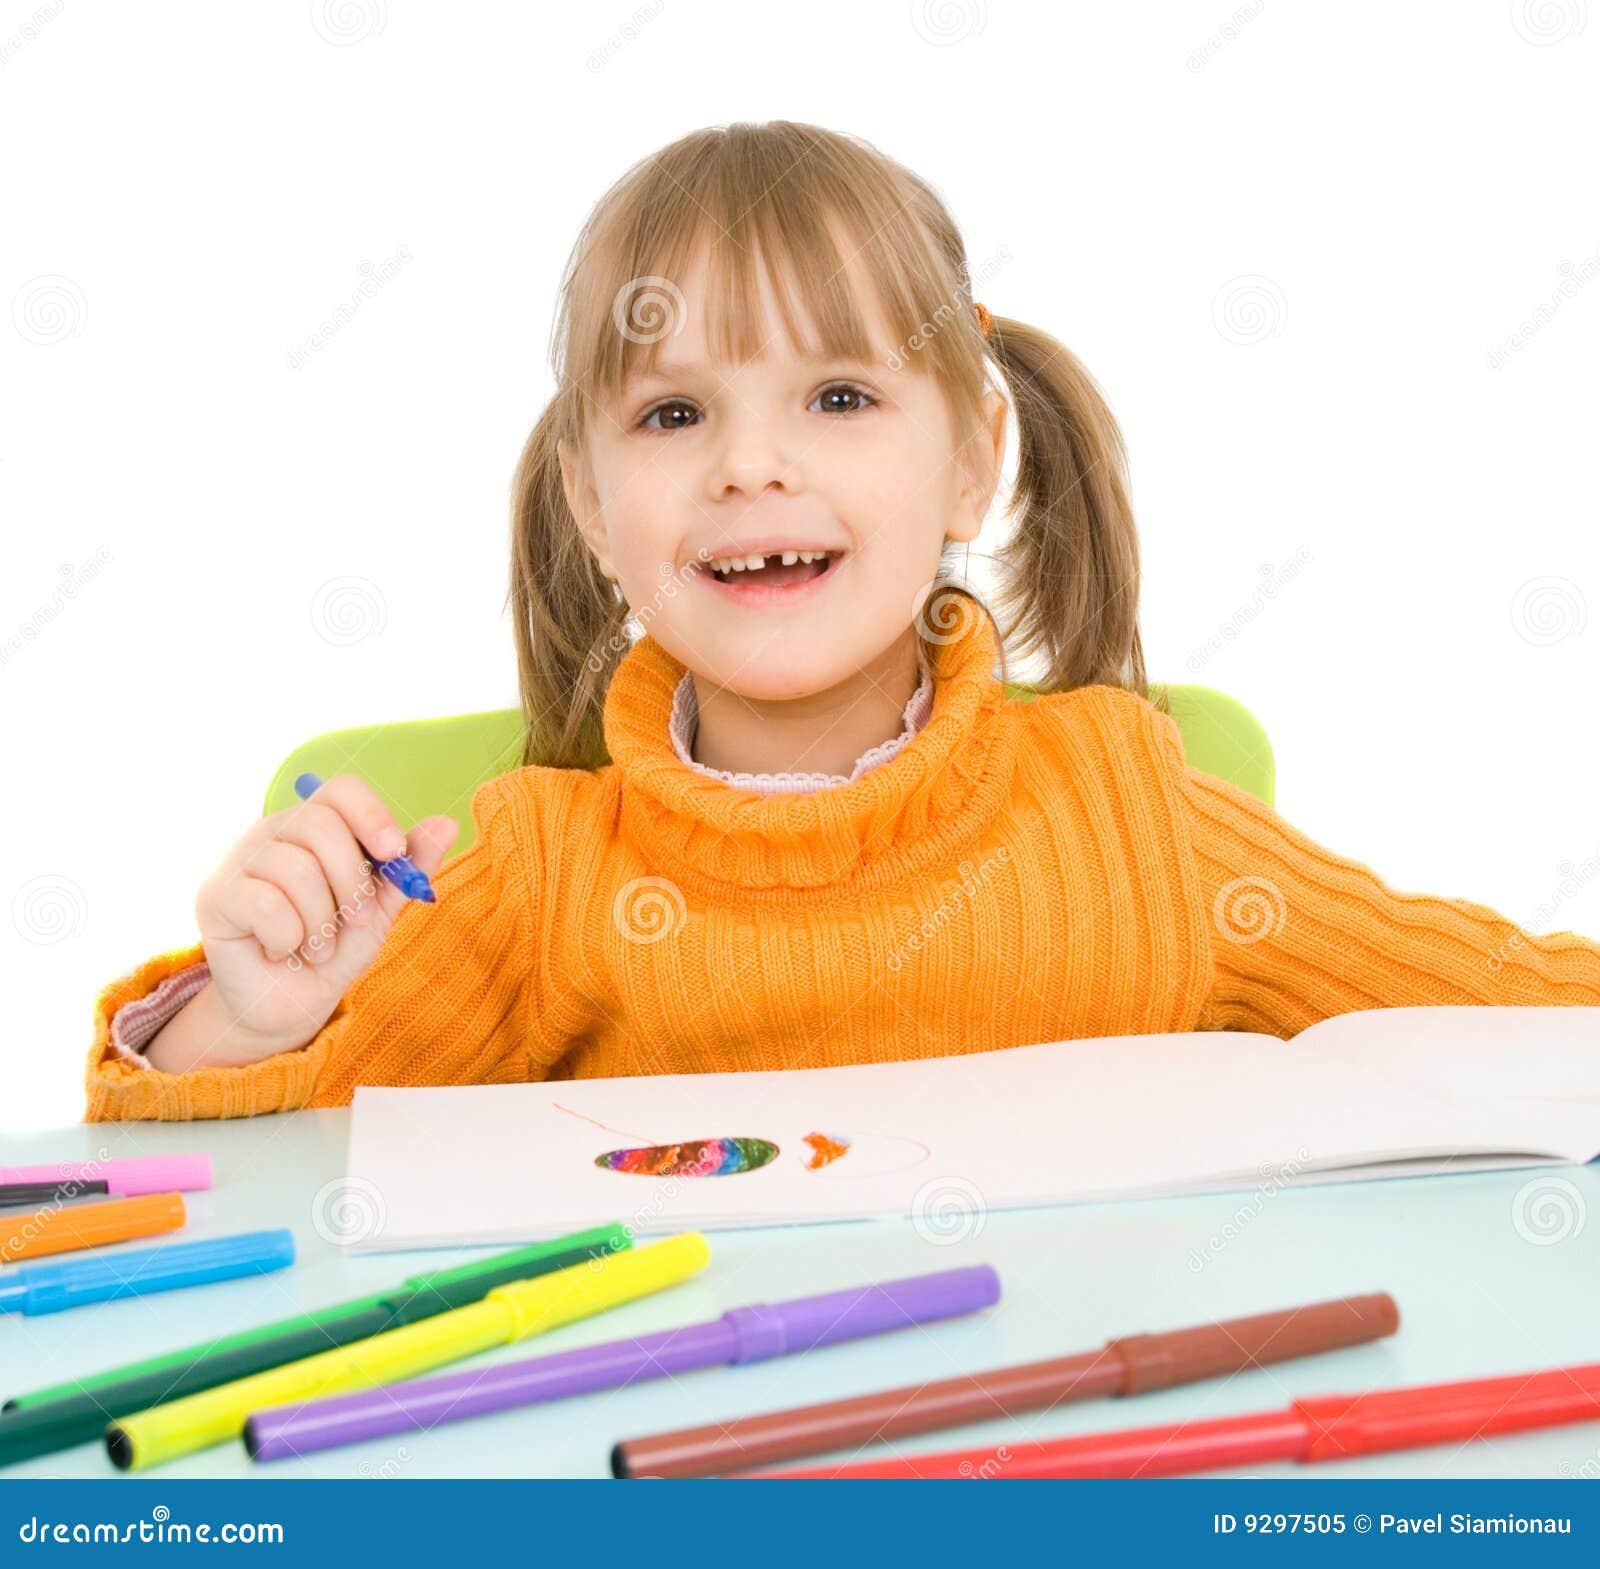 Barnet tecknar